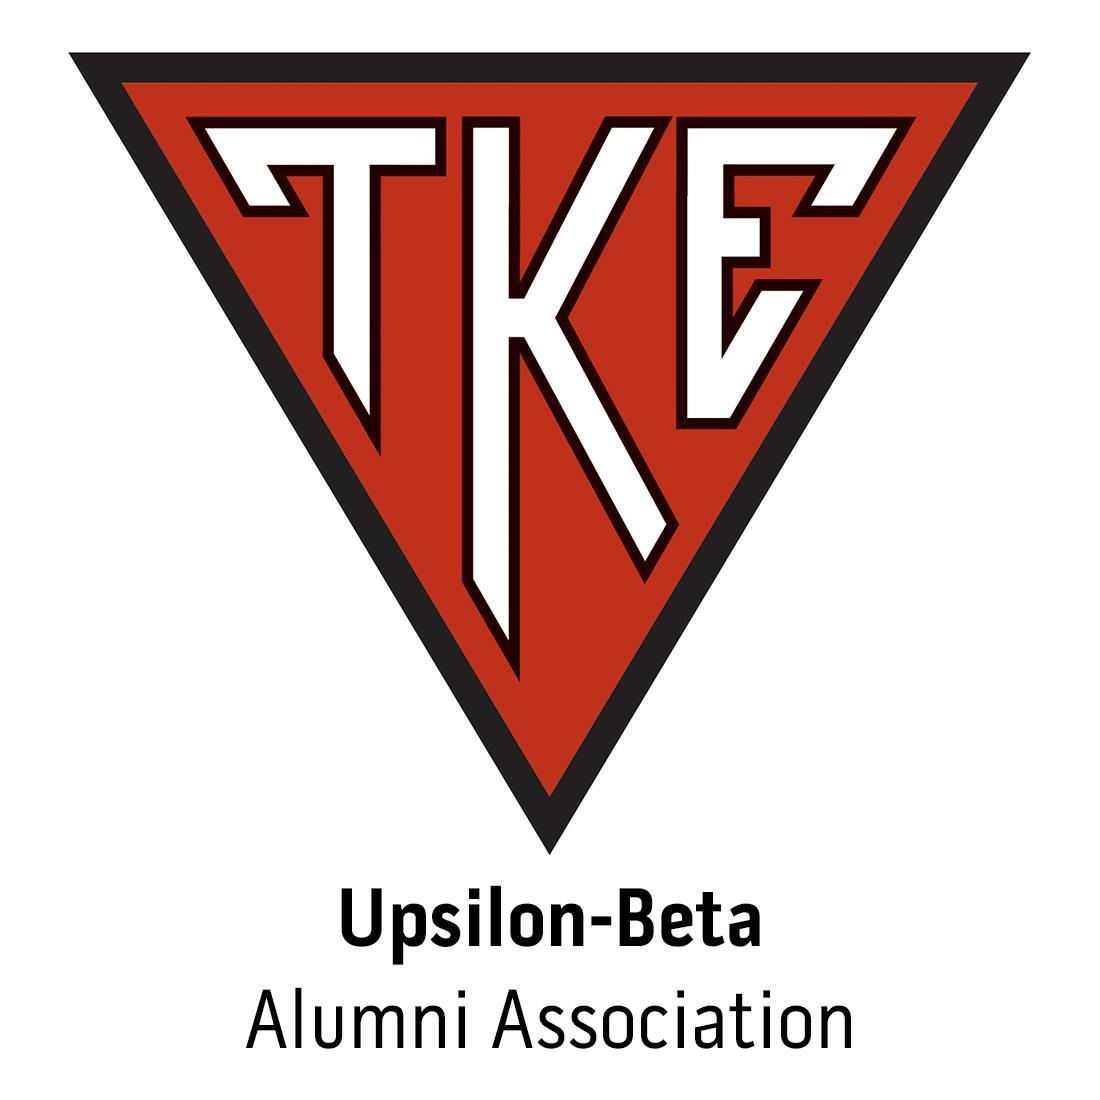 Upsilon-Beta Alumni Association at California State University, Northridge